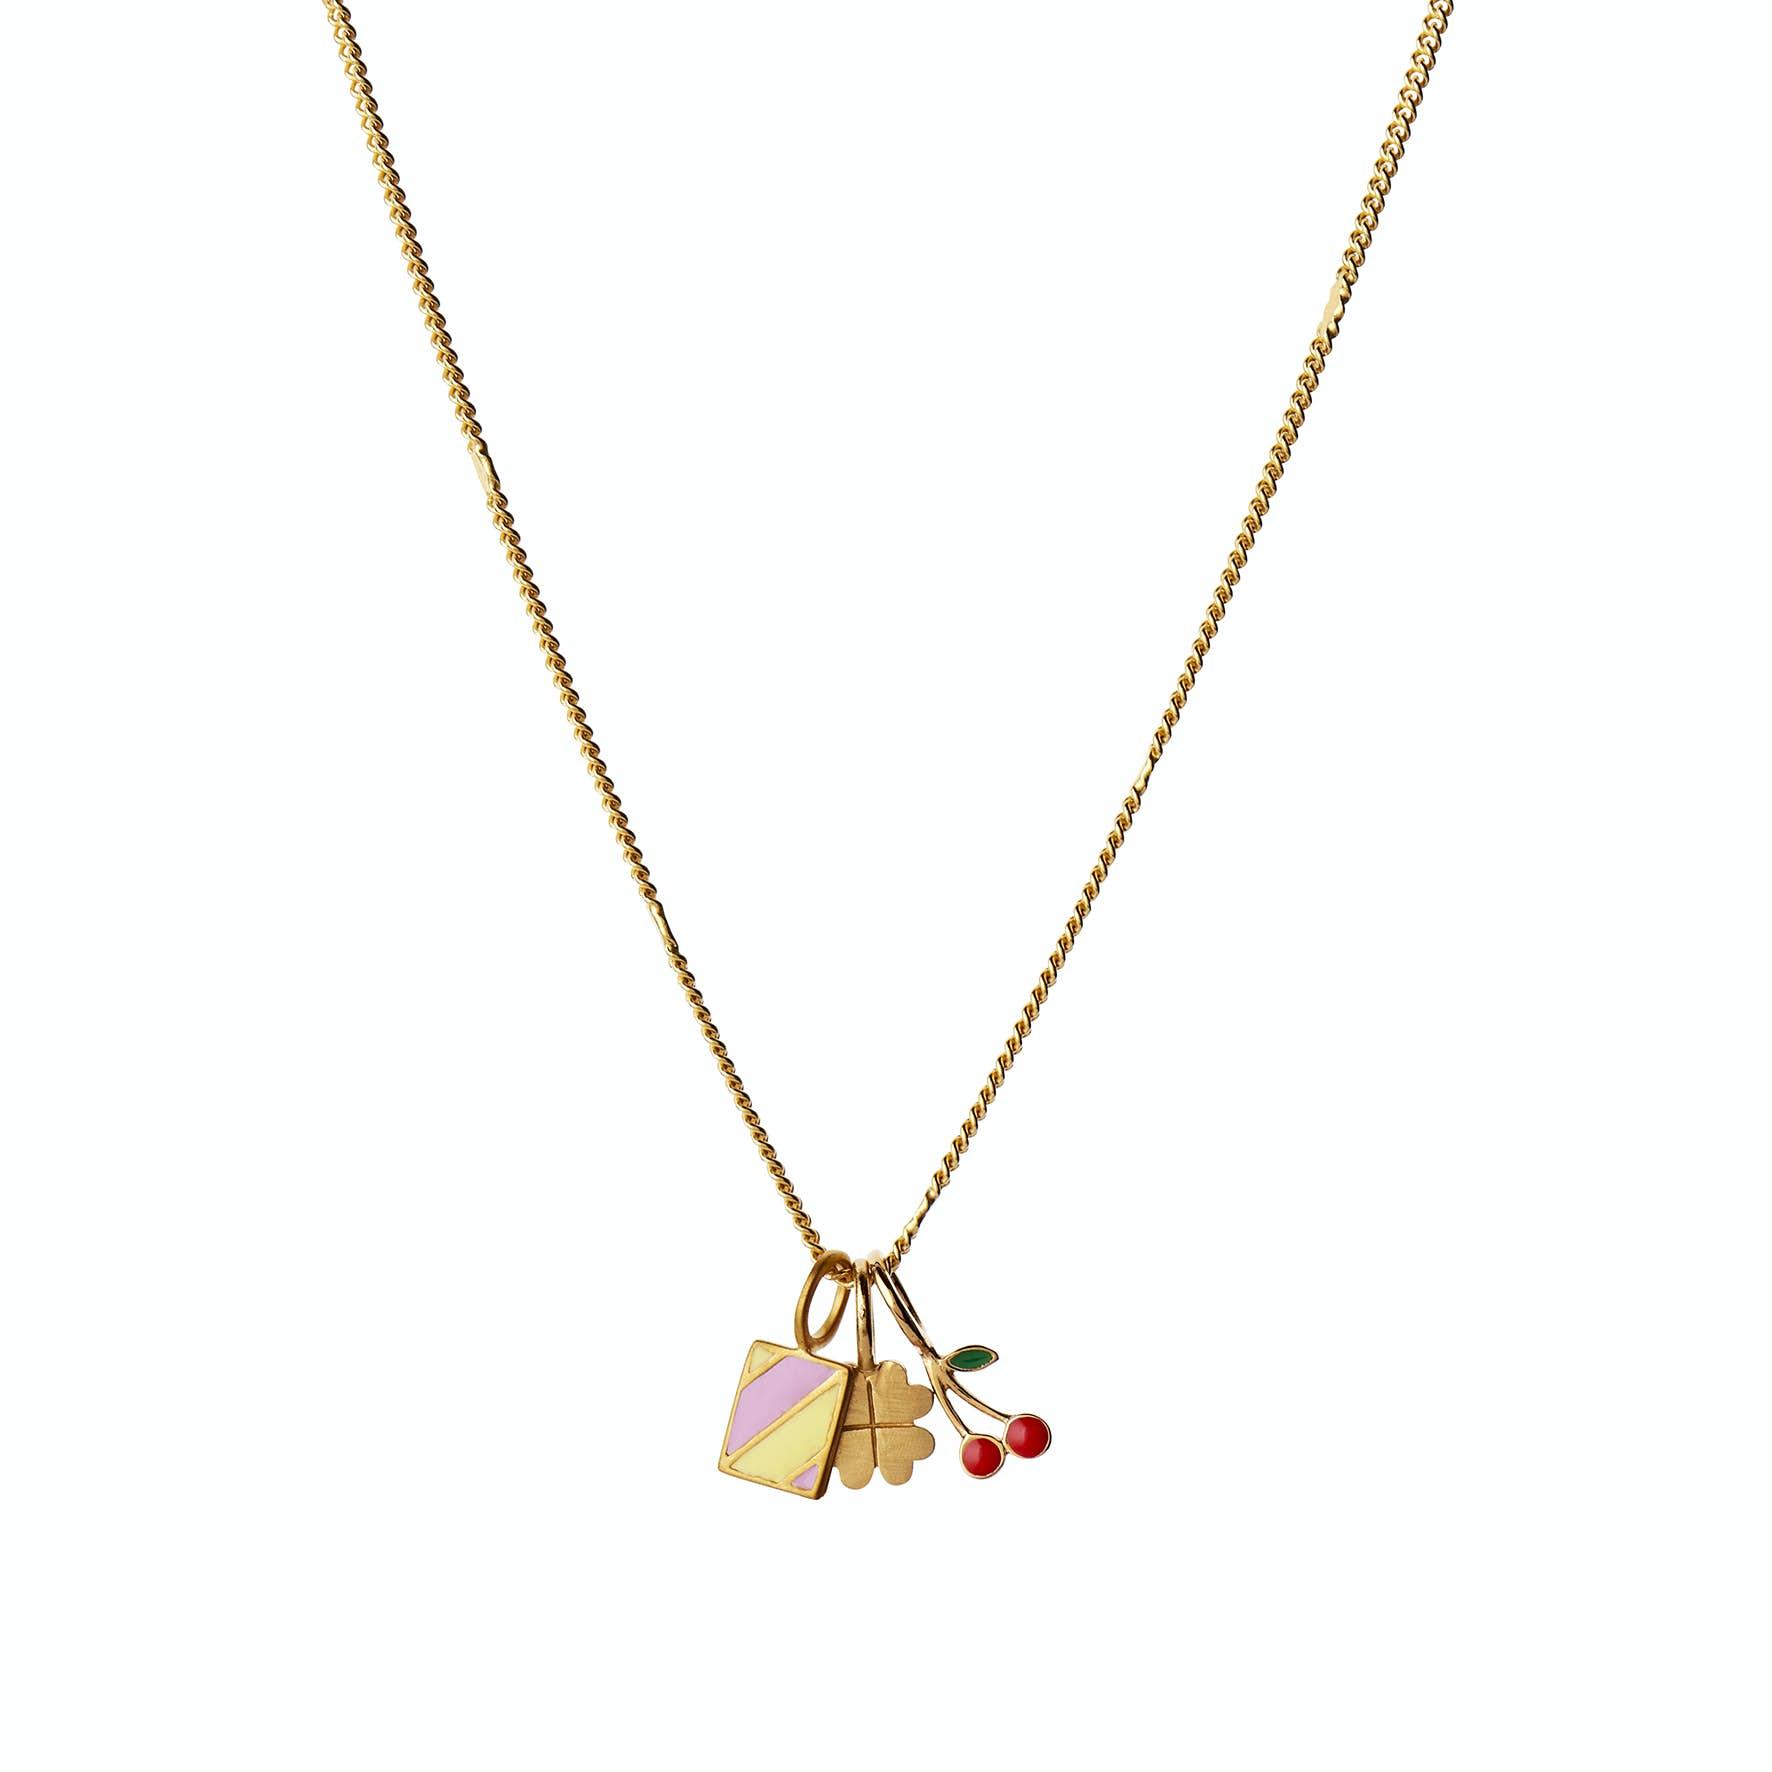 Petit Cherry Pendant Enamel von STINE A Jewelry in Vergoldet-Silber Sterling 925